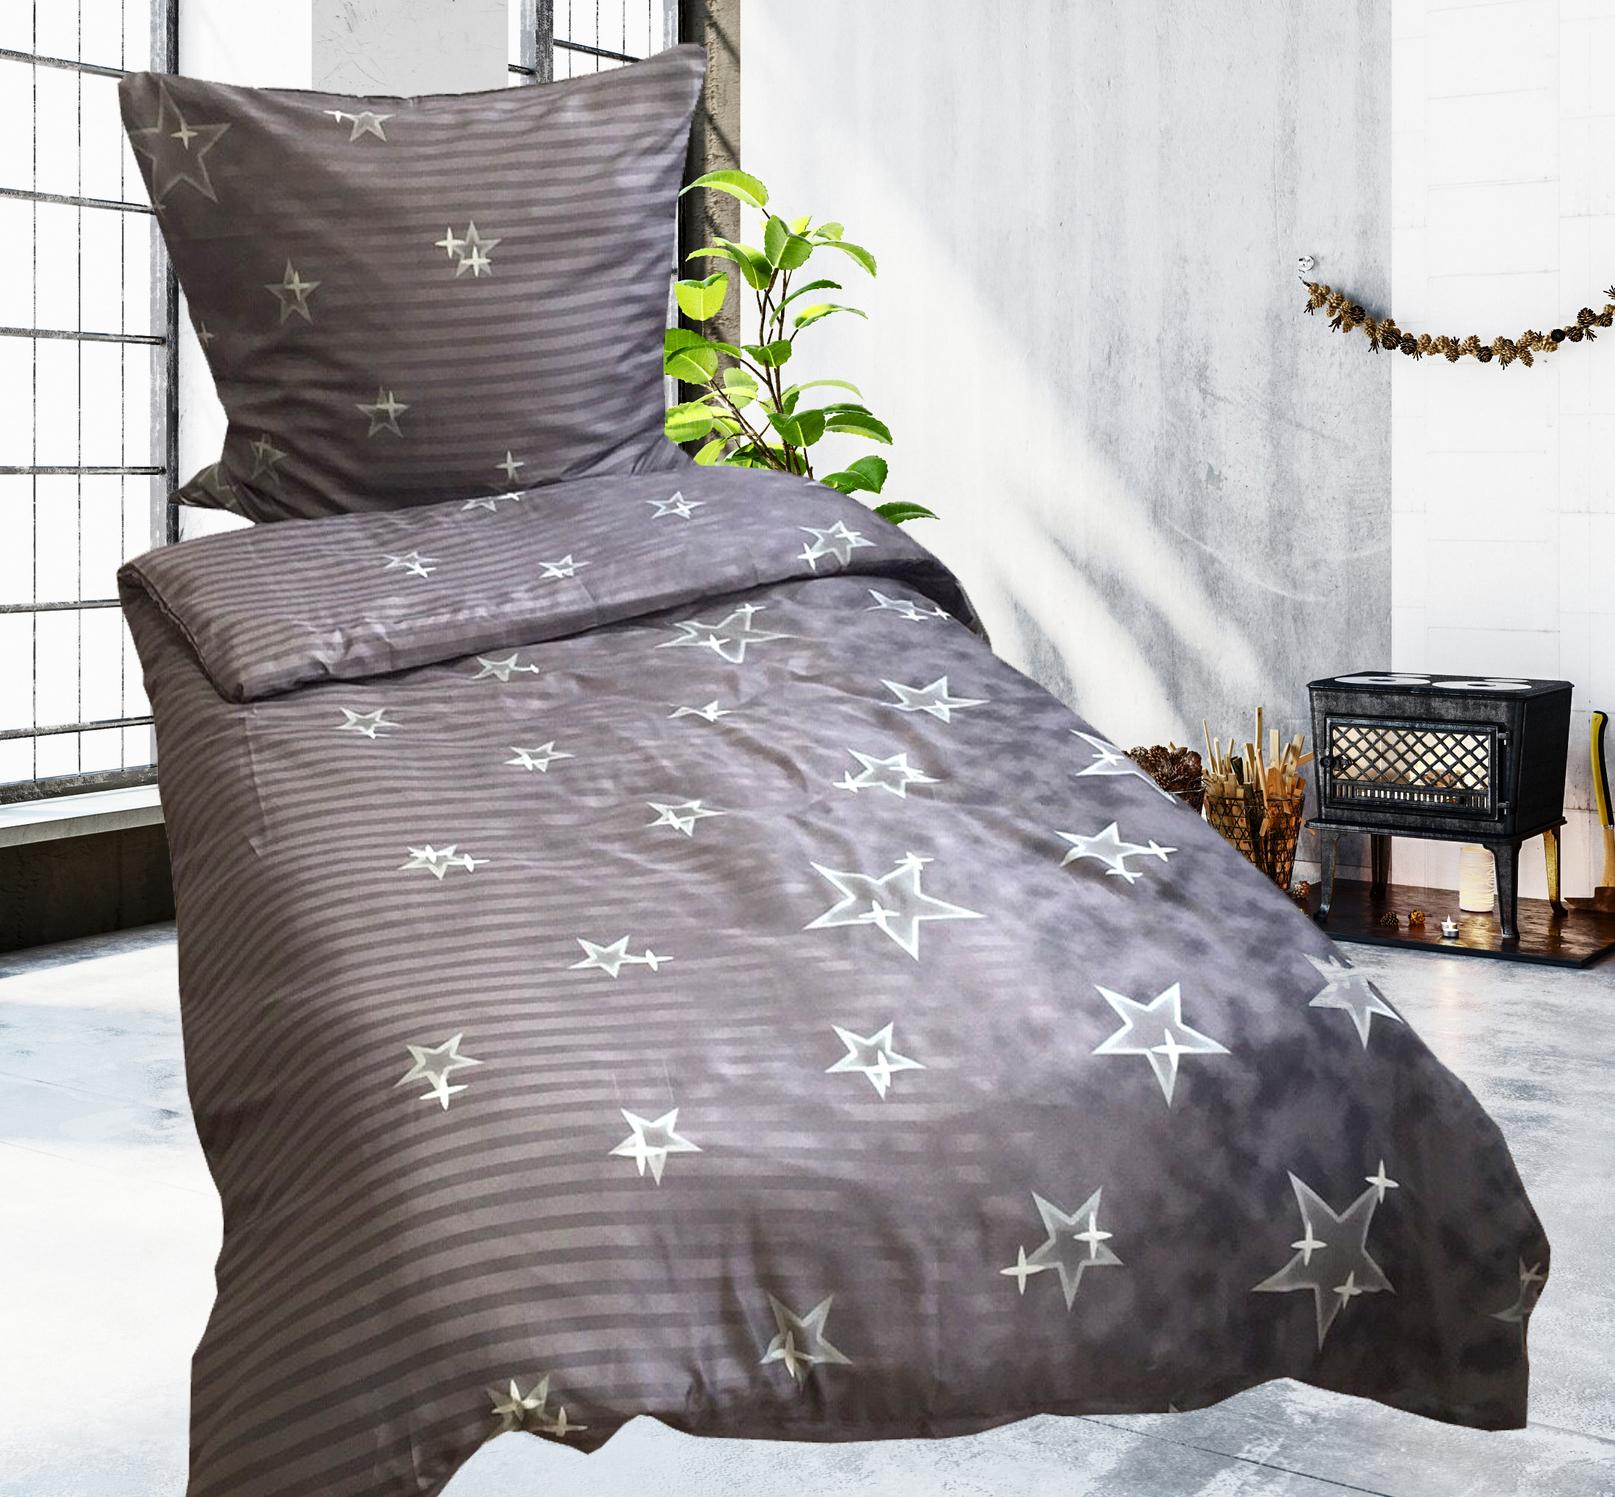 2 tlg bettw sche microfaser 135x200 cm sterne grau neu. Black Bedroom Furniture Sets. Home Design Ideas